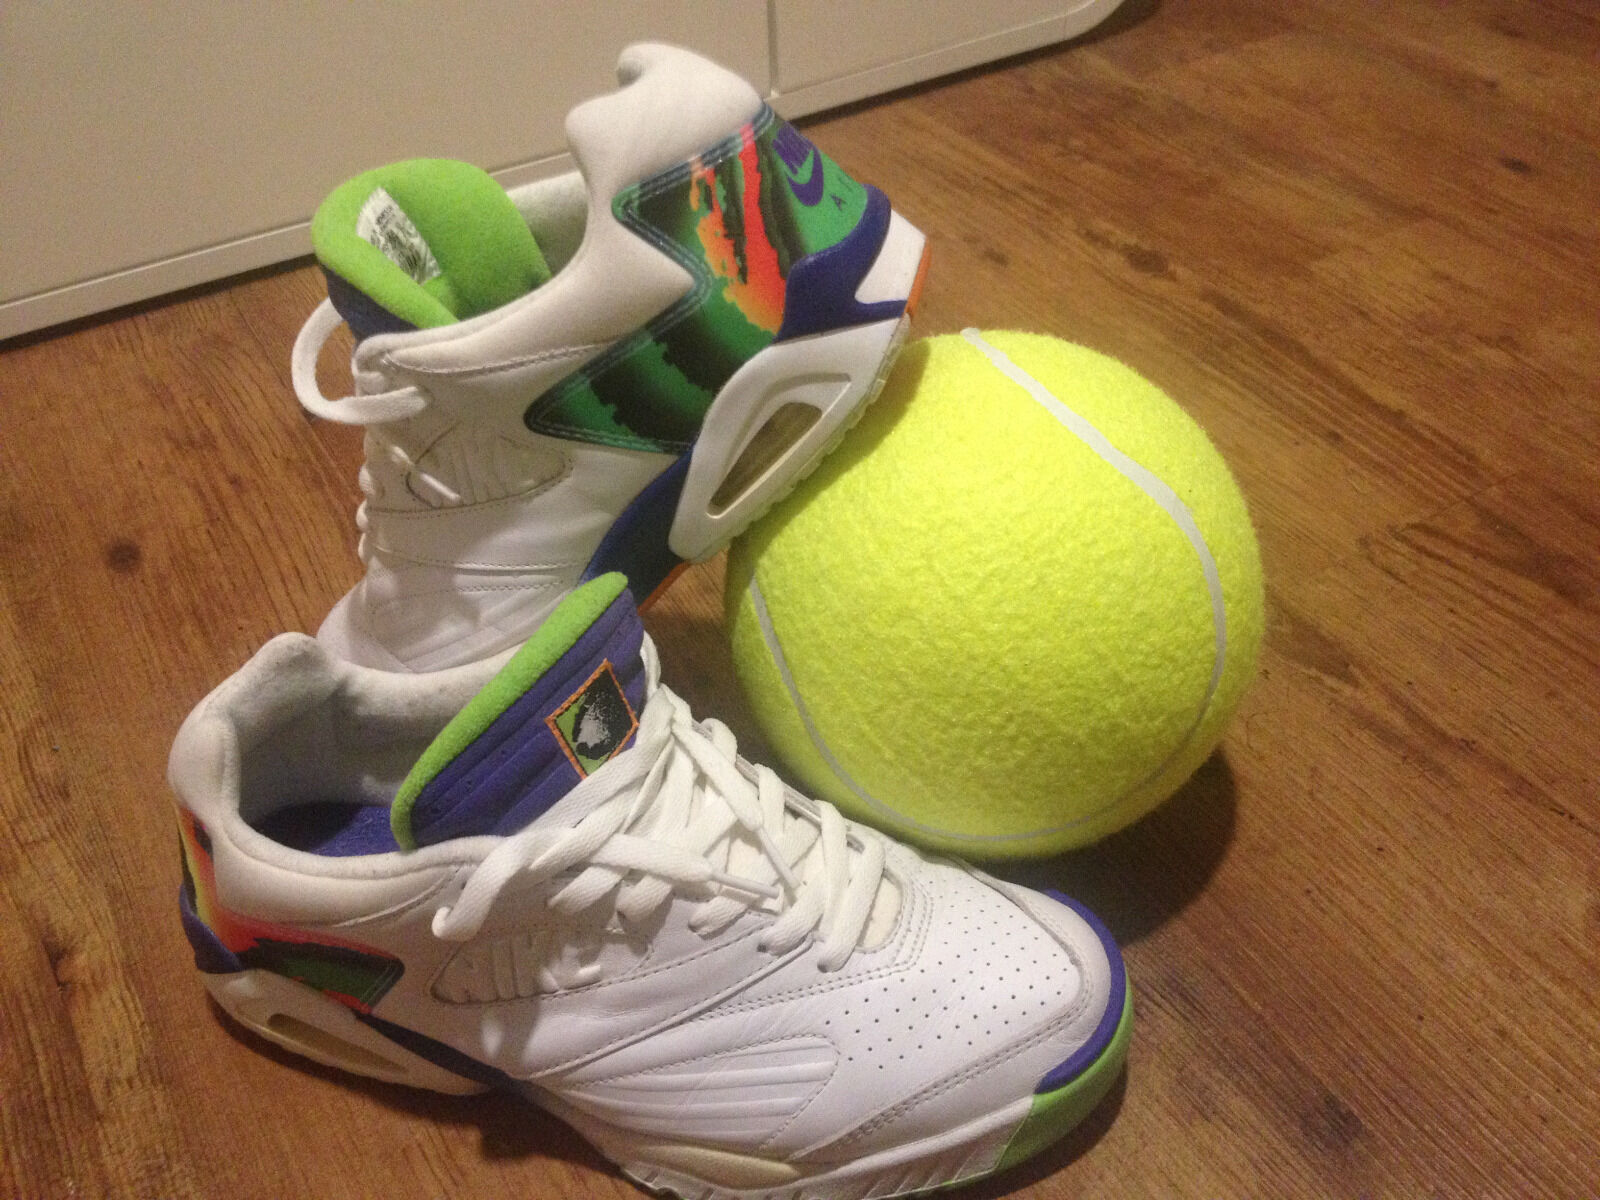 "Nike Air Tech Challenge IV Low ""Kiwi"" Retro OG ""Andre Agassi"" (EU 44.5)"